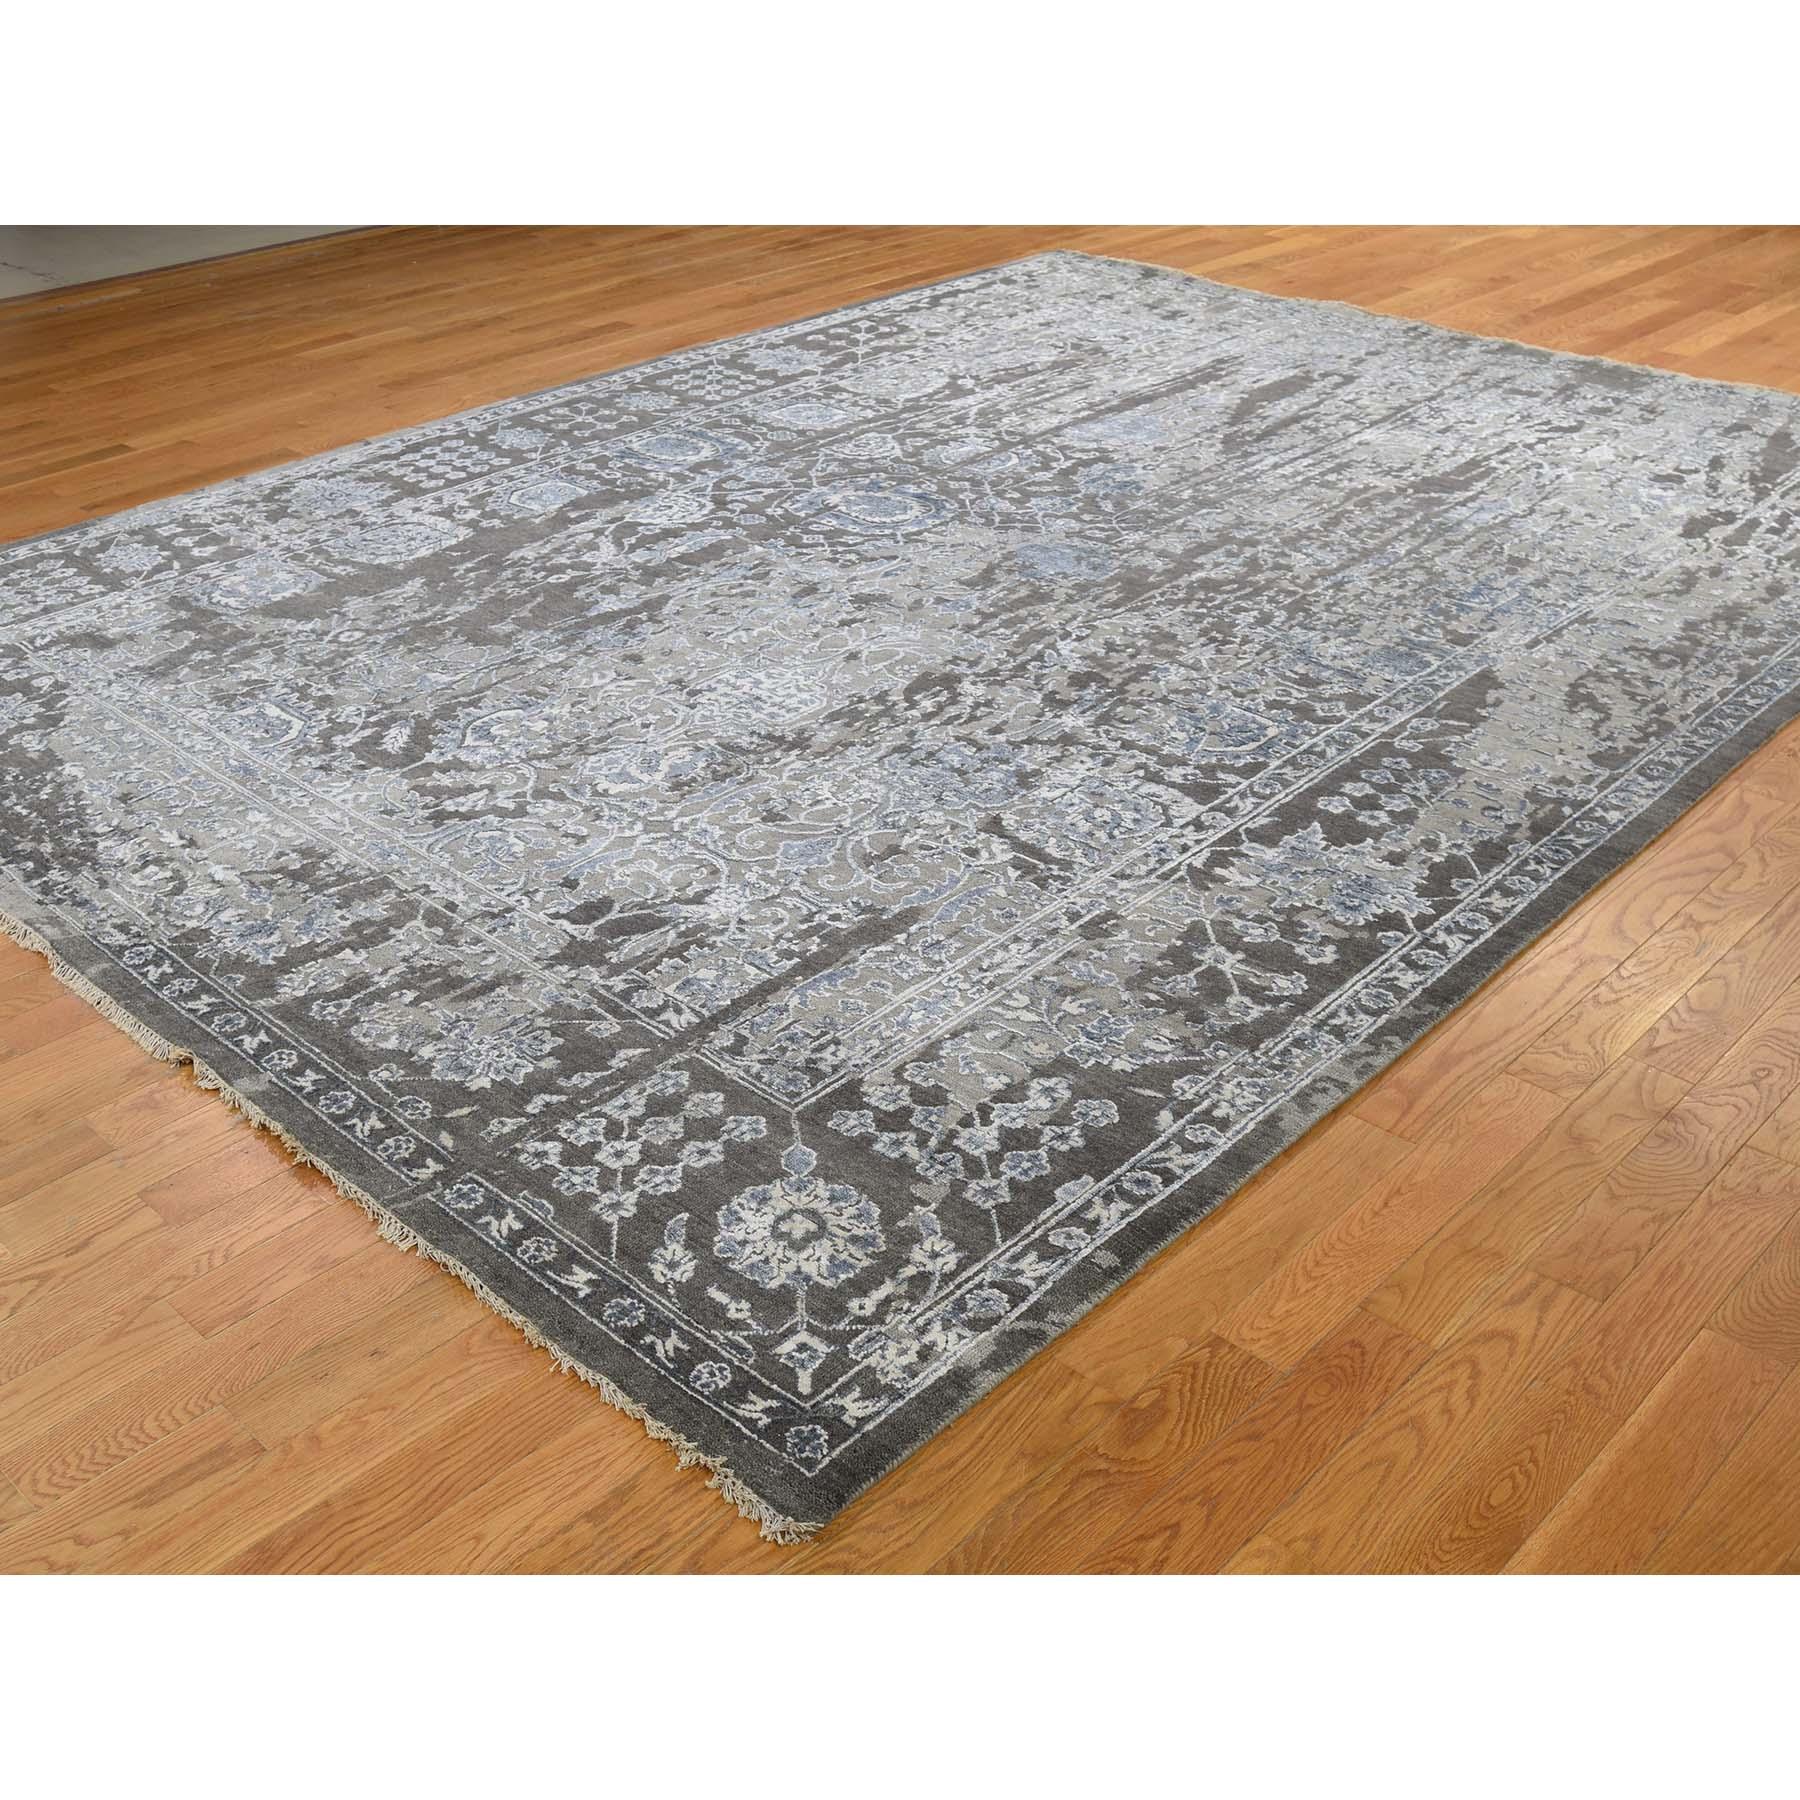 9-2 x11-10  Persian Tabriz Broken Design Wool And Silk Hand-Knotted Oriental Rug